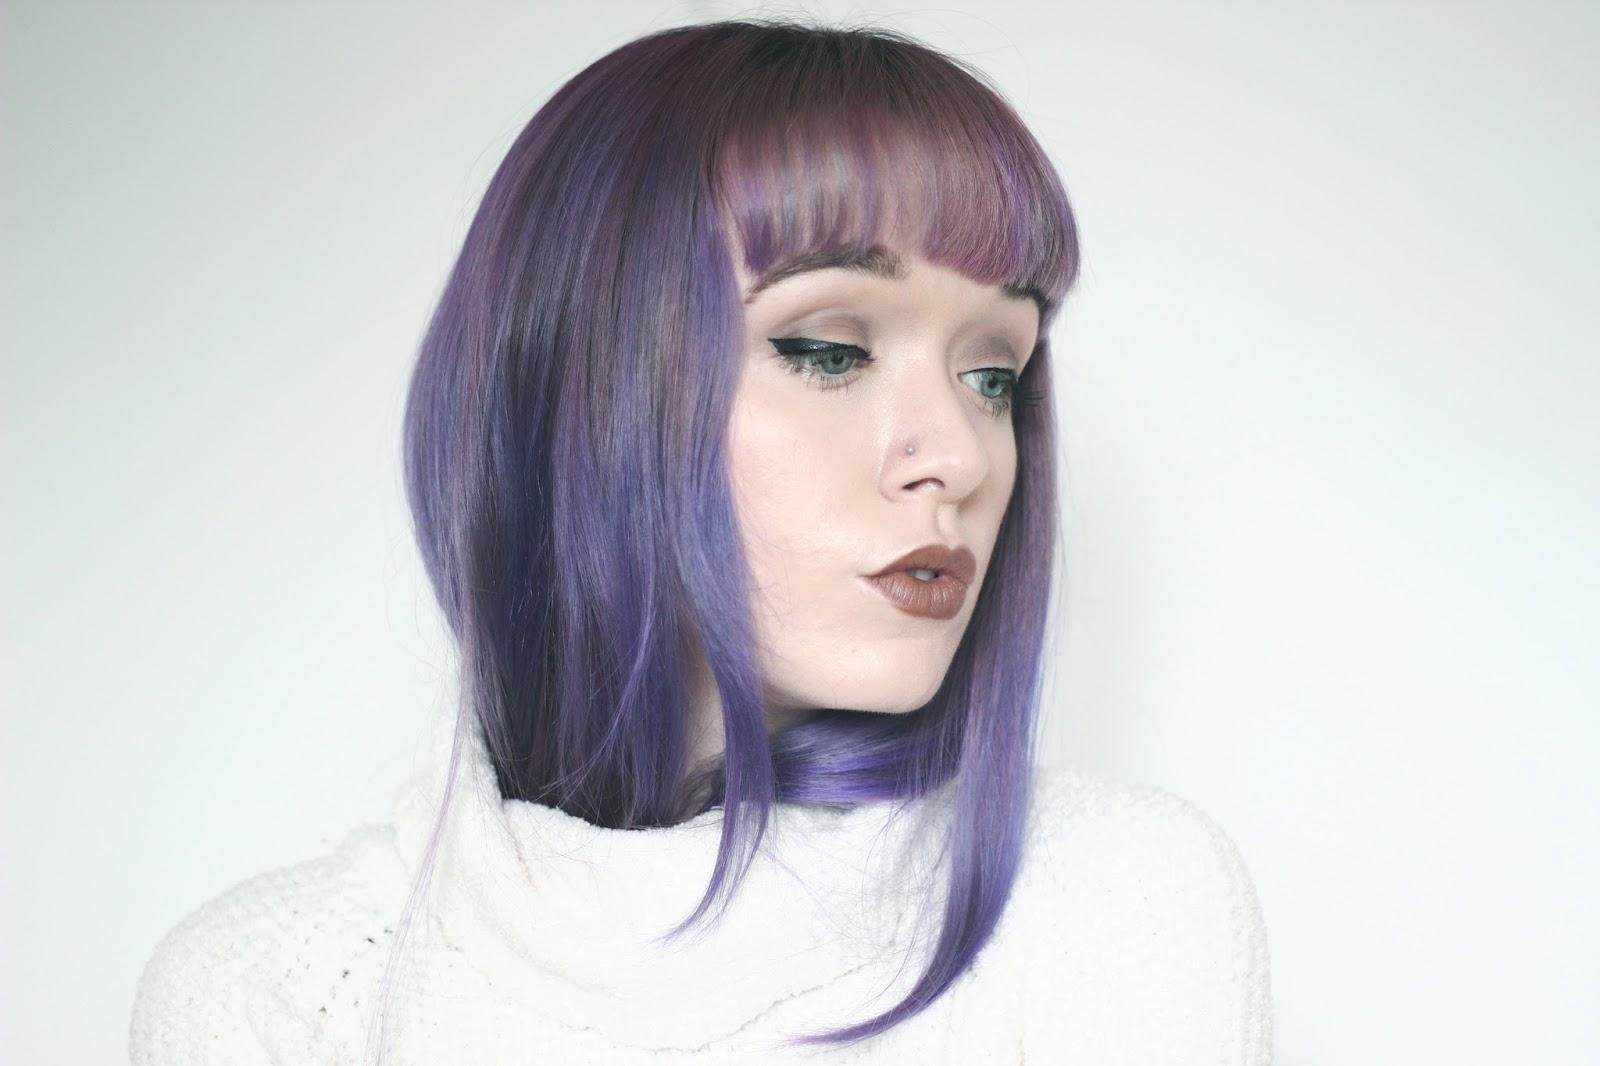 Grunge-Everyday-Make-Up-mac-cork-lipliner